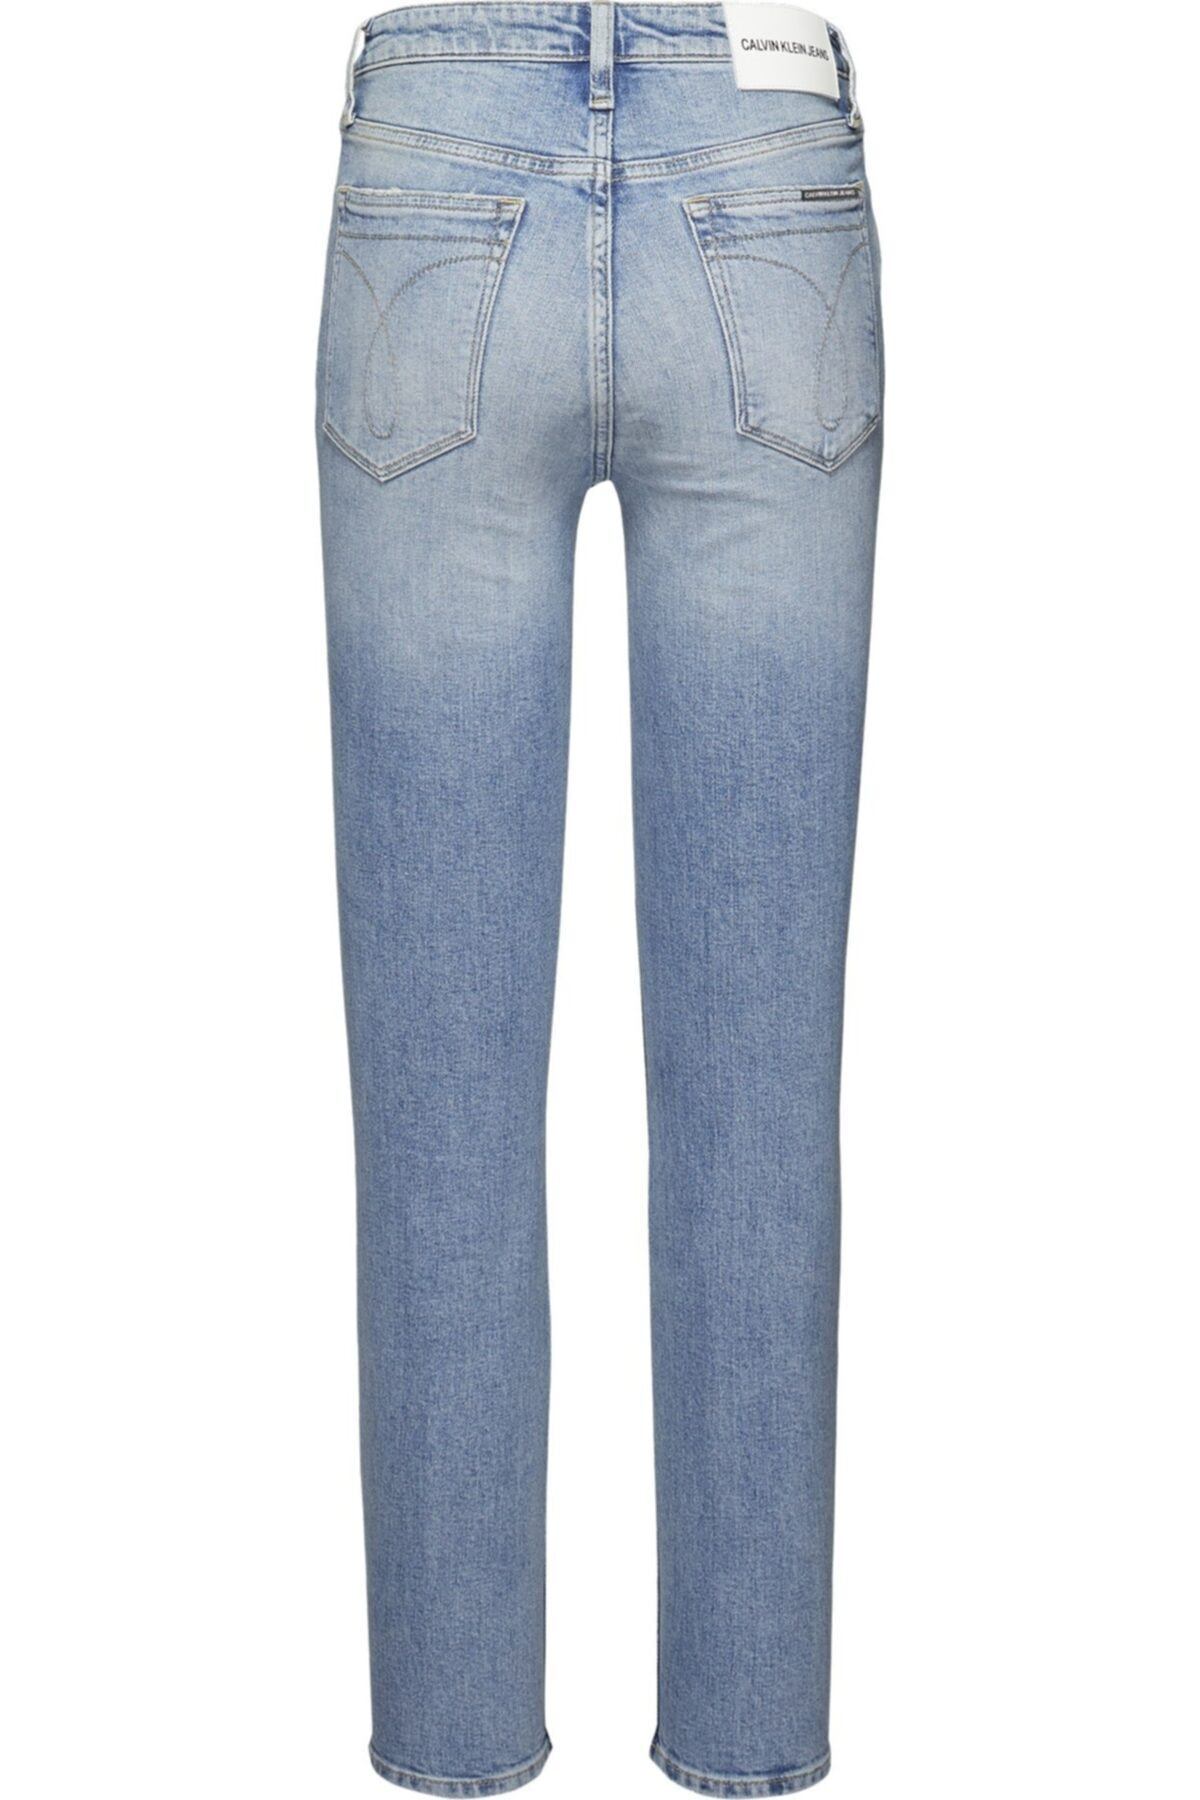 Calvin Klein J20j207627 Unisex Mavi  Pantolon 2